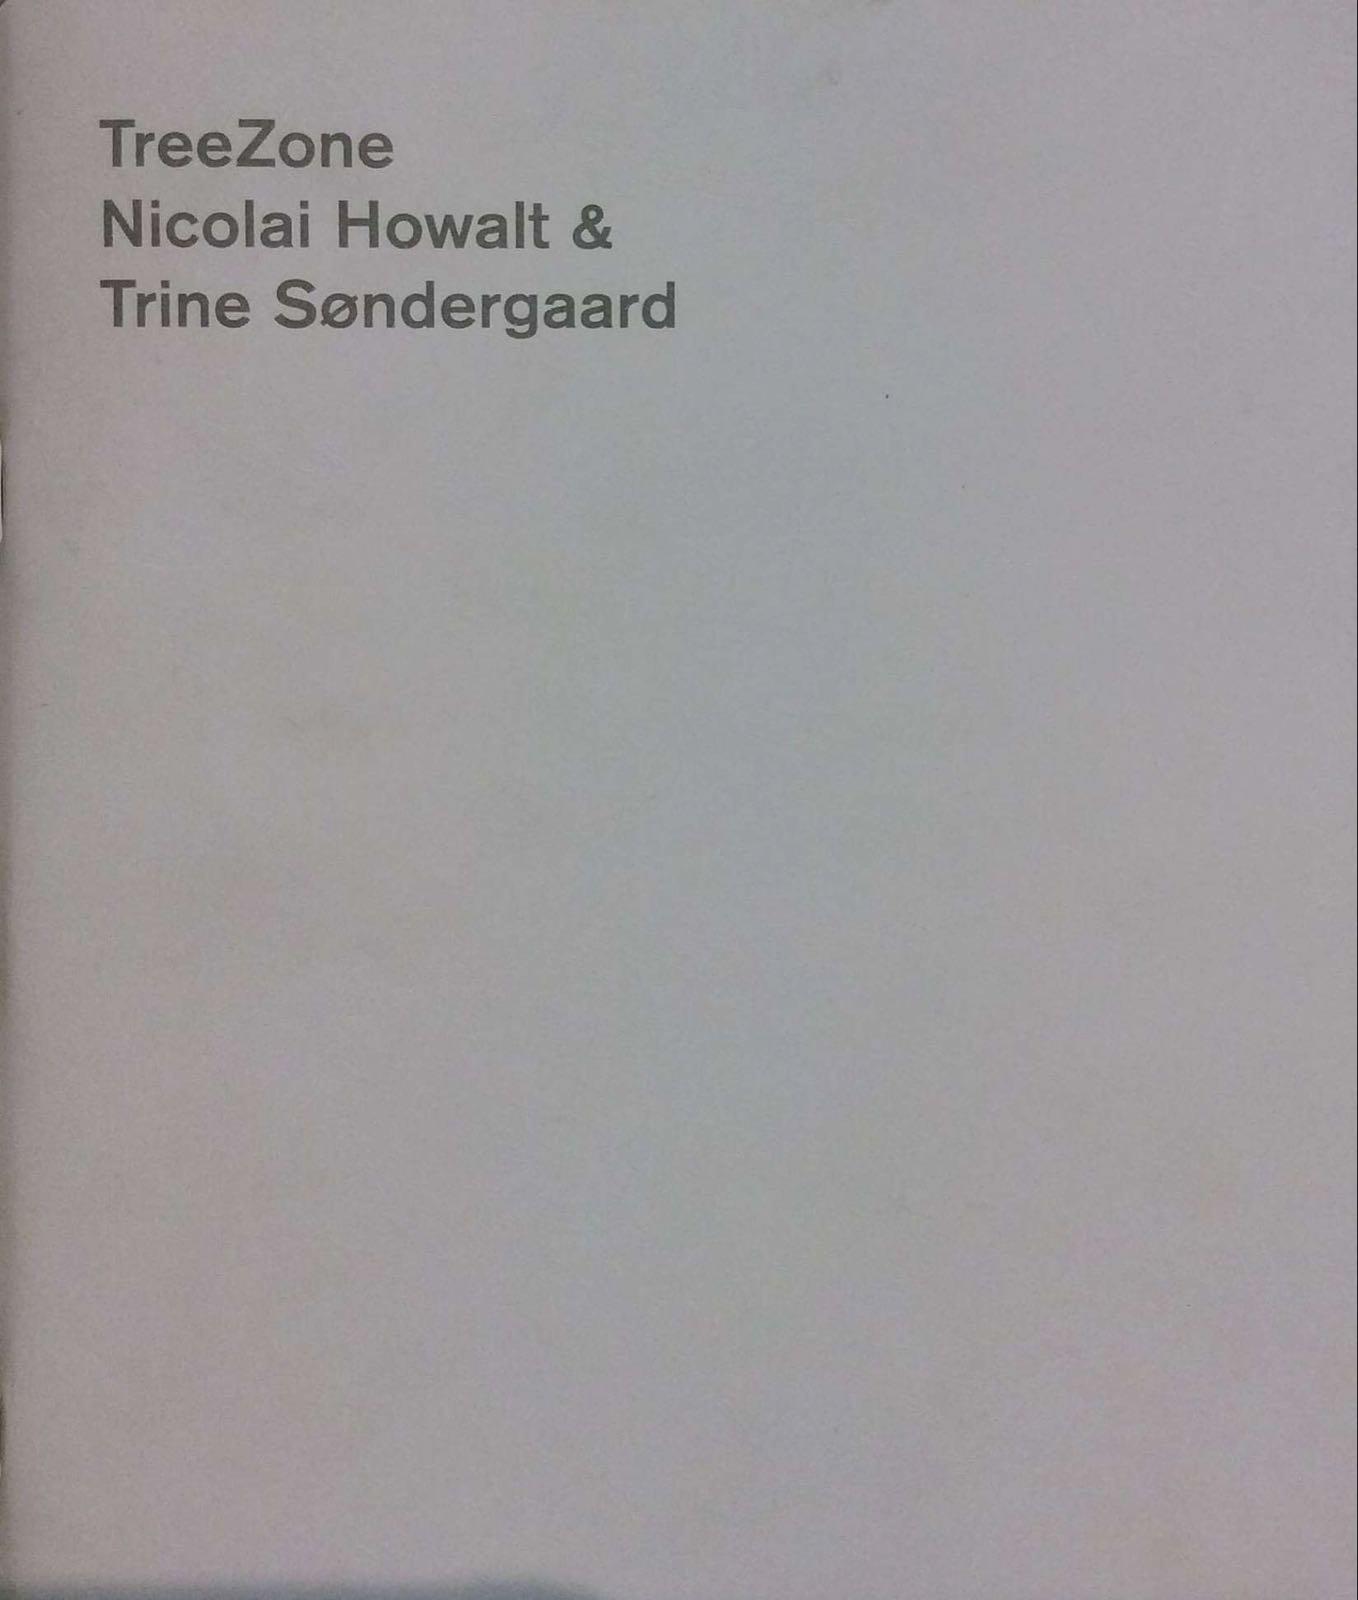 Howalt, Nicolai & T. Søndergaard. TreZone